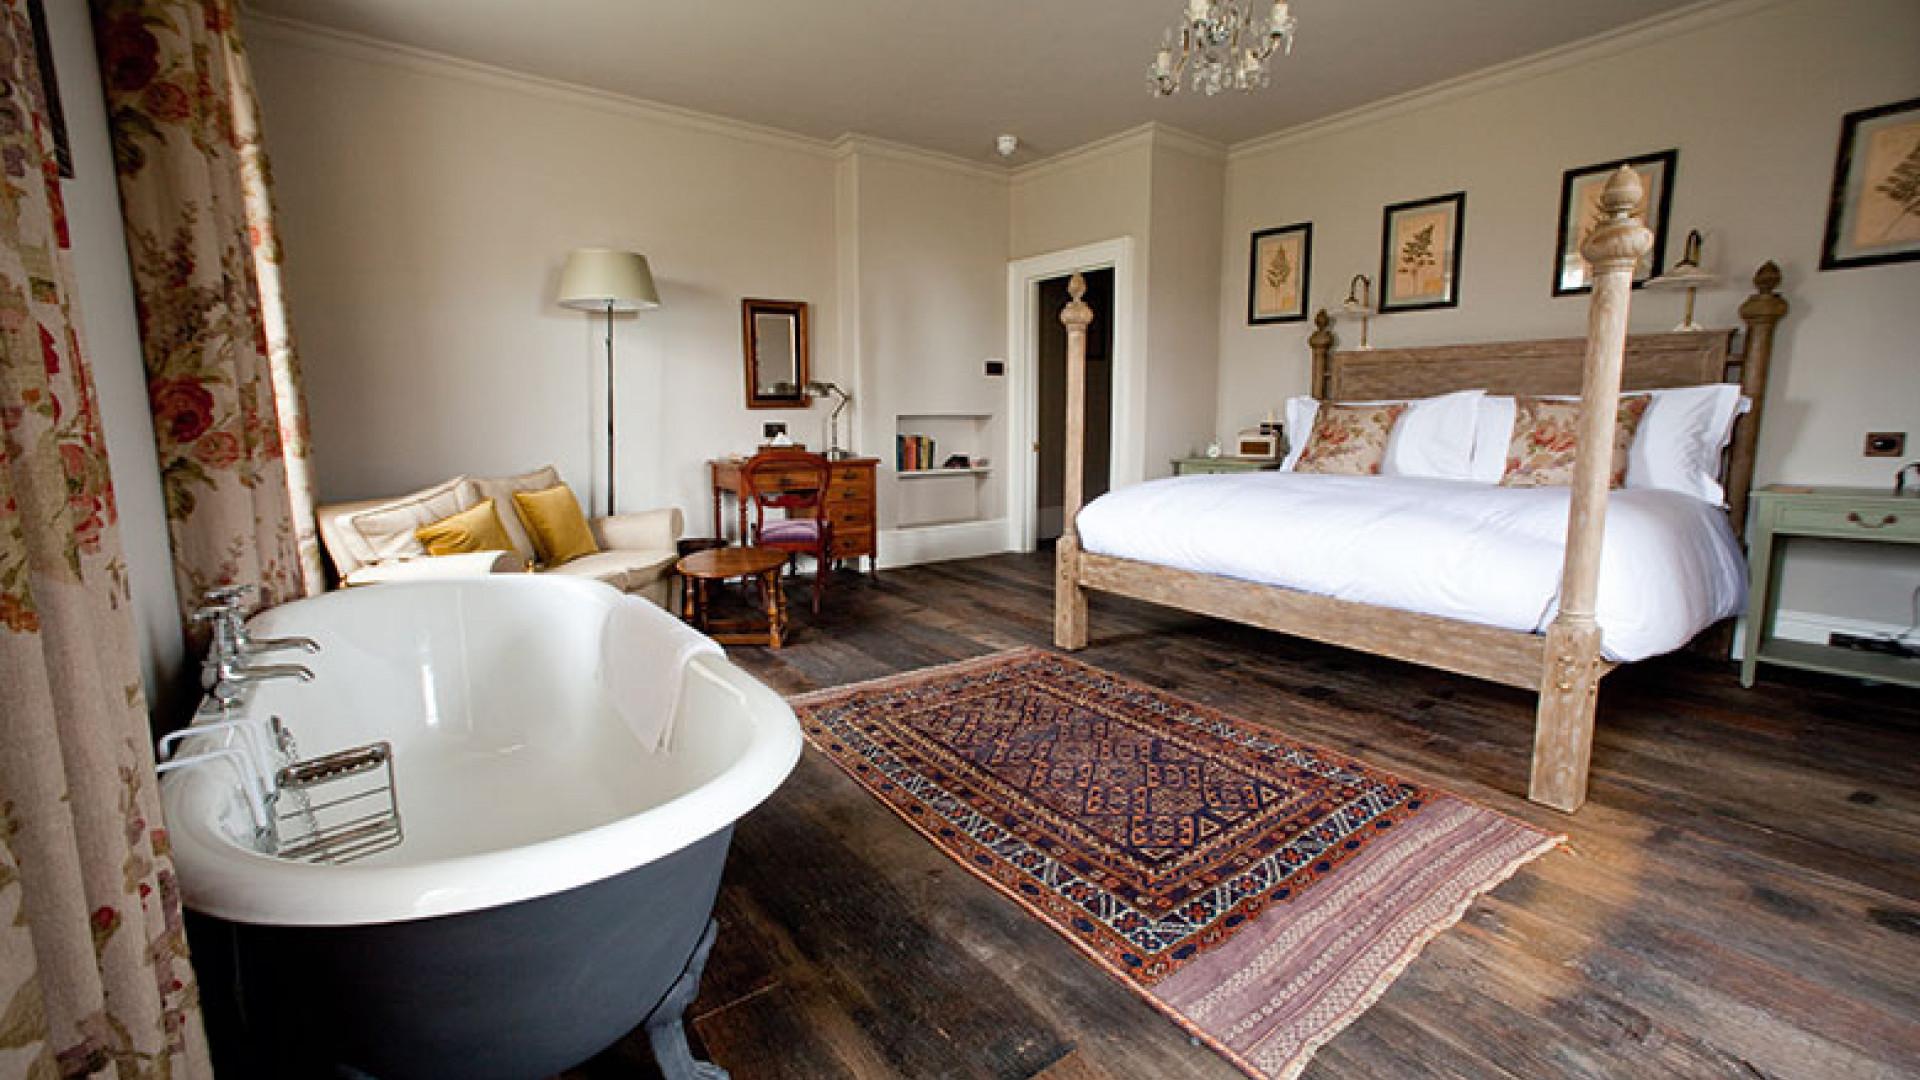 THE-PIG-near-Bath,-Bedroom